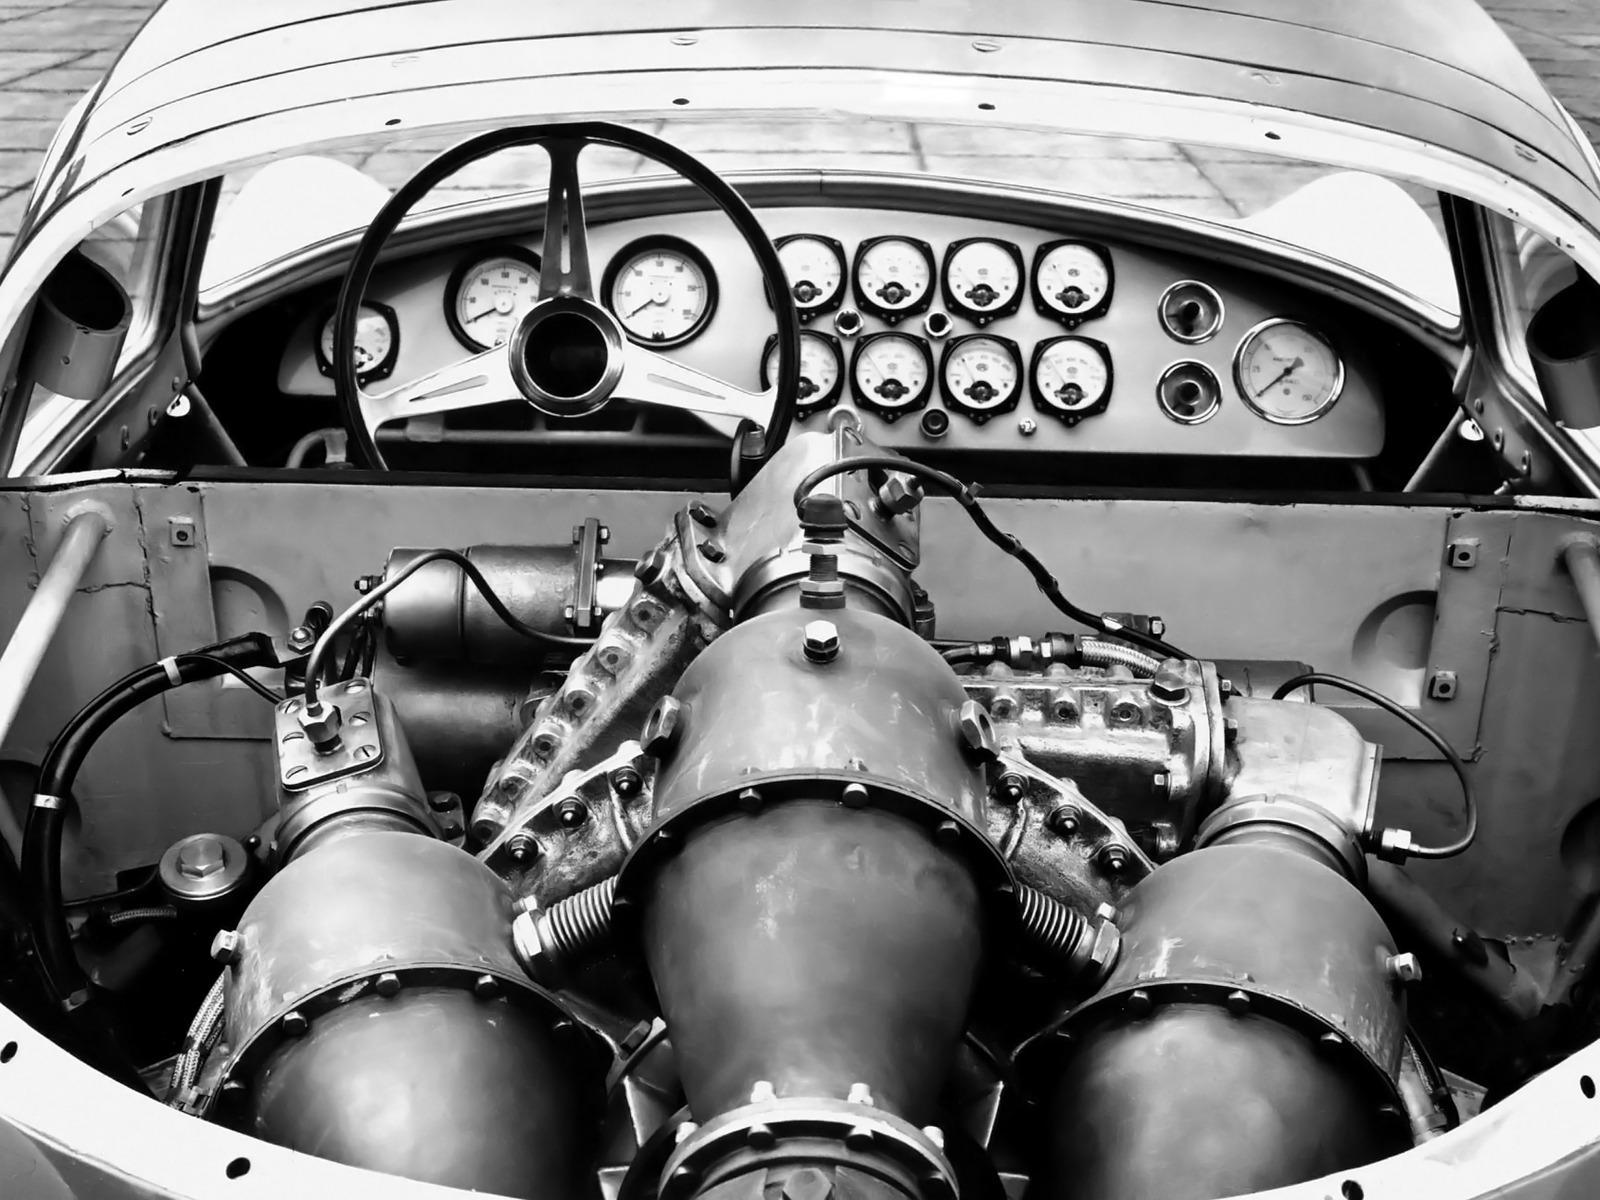 Saab Dealer Near Me >> Fiat Turbina (1954) - Old Concept Cars